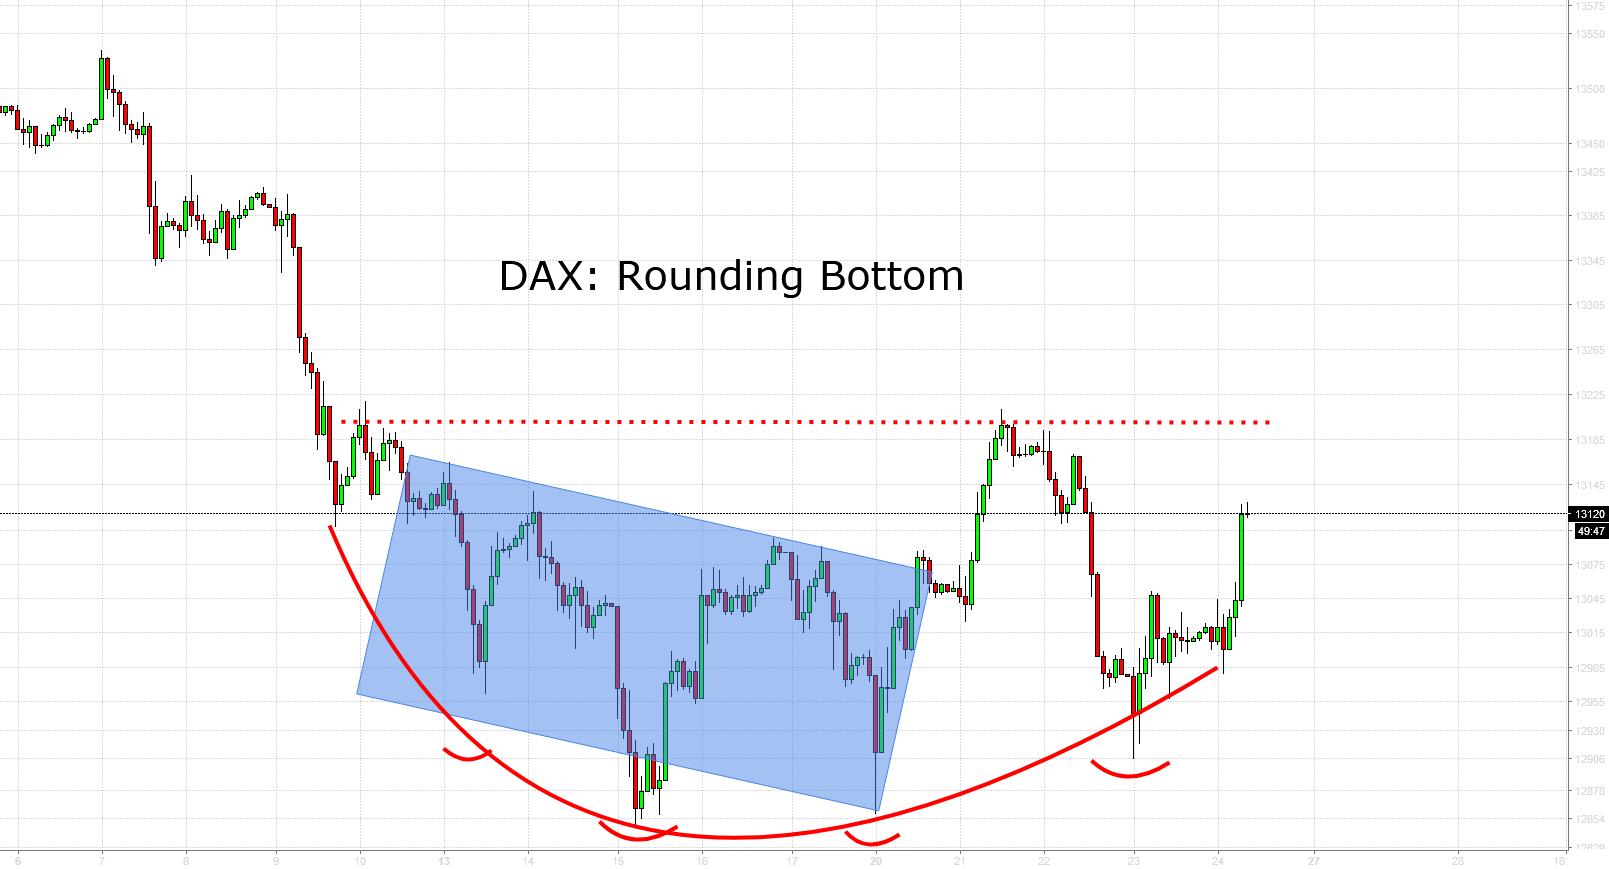 DAX: Rounding Bottom - Kursziel neue ATH´s